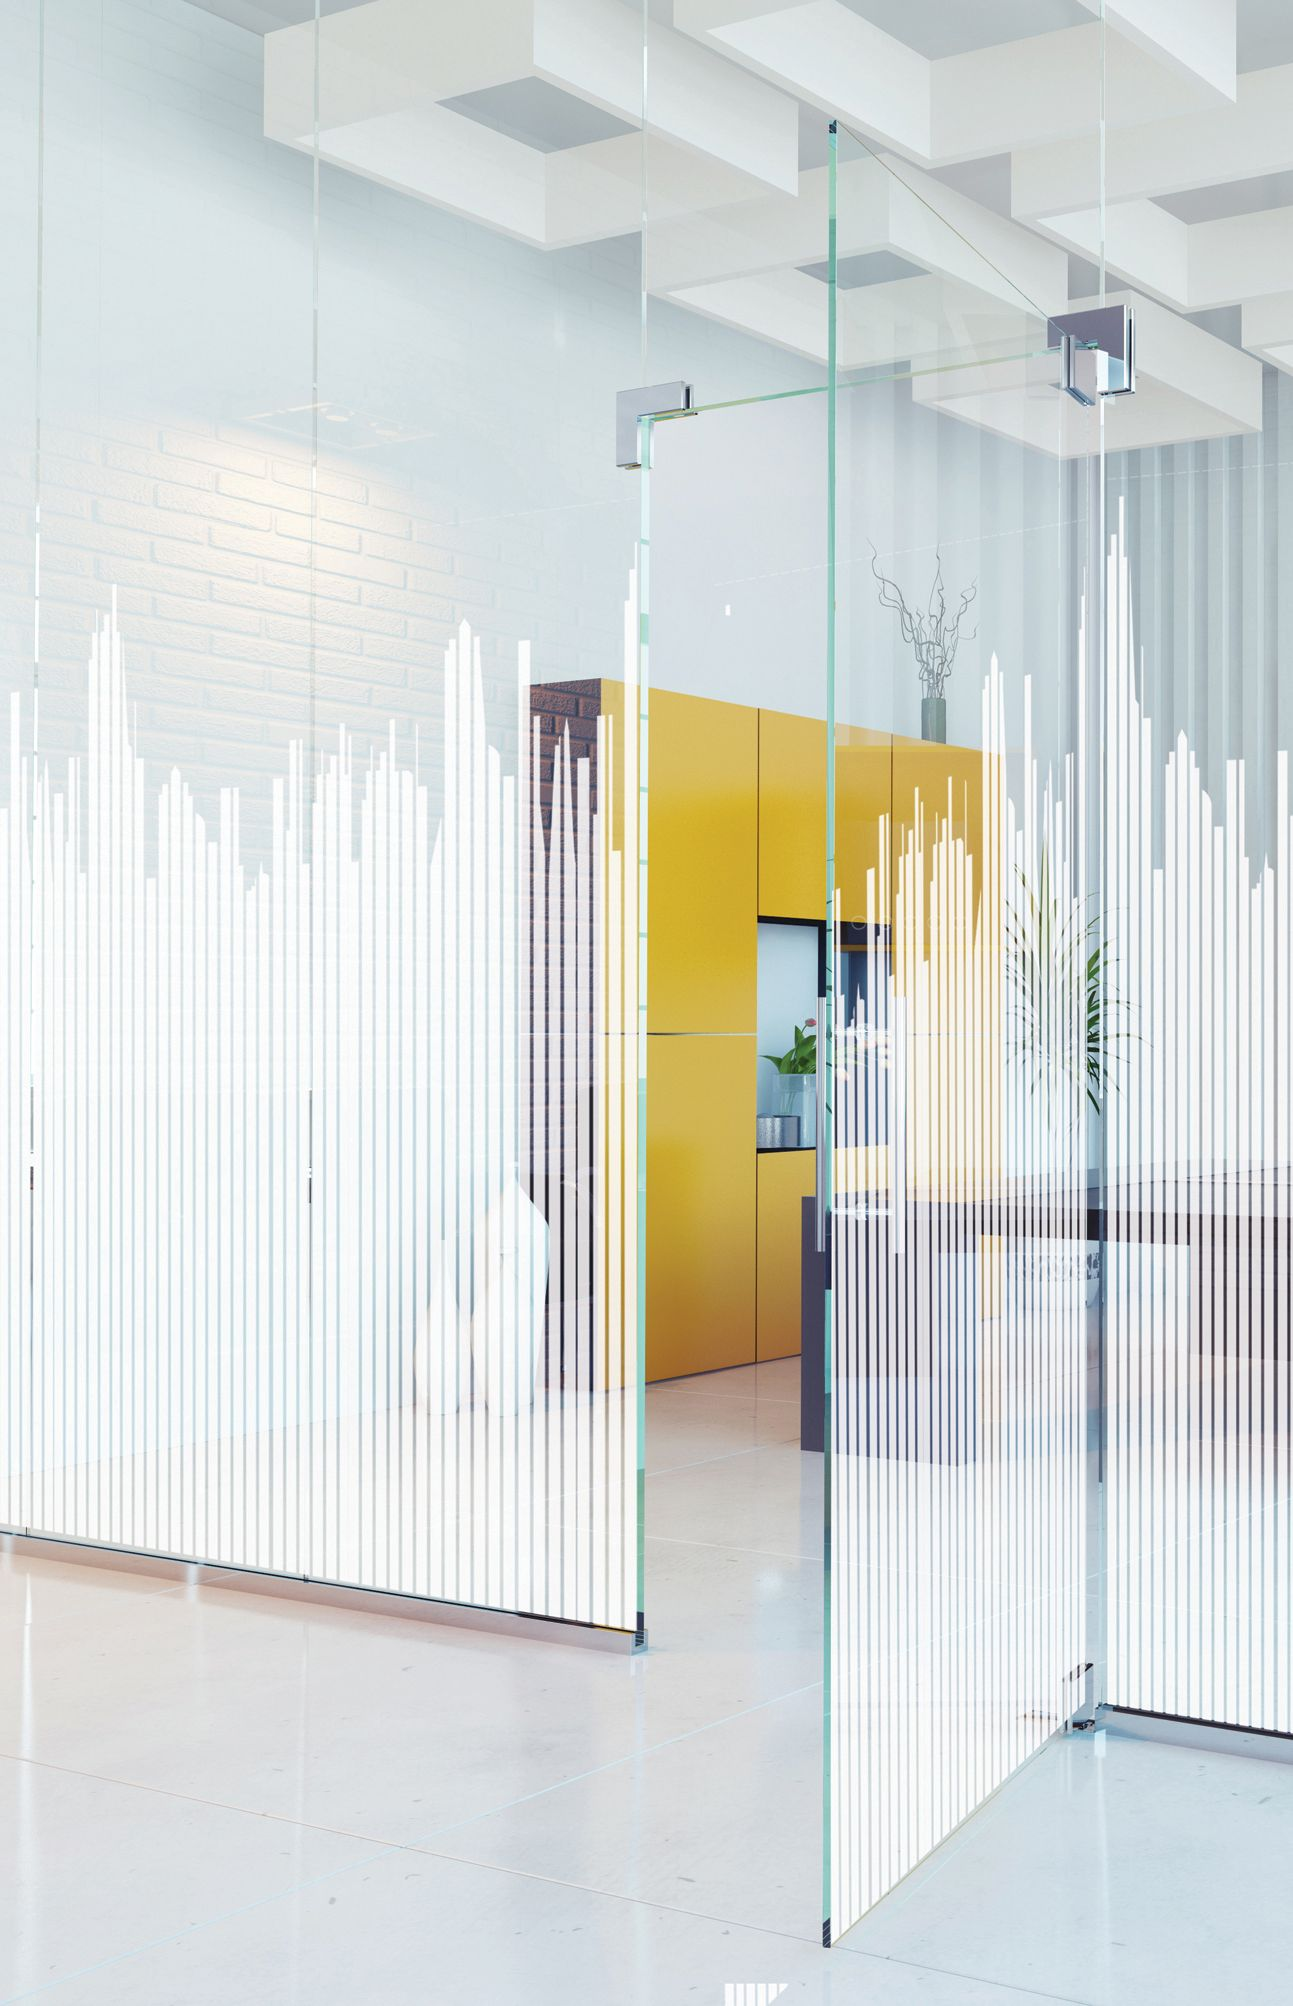 Pin by sandrine pierrot on office idea design pinterest glass partition window film and glass - Fenetre baie window ...